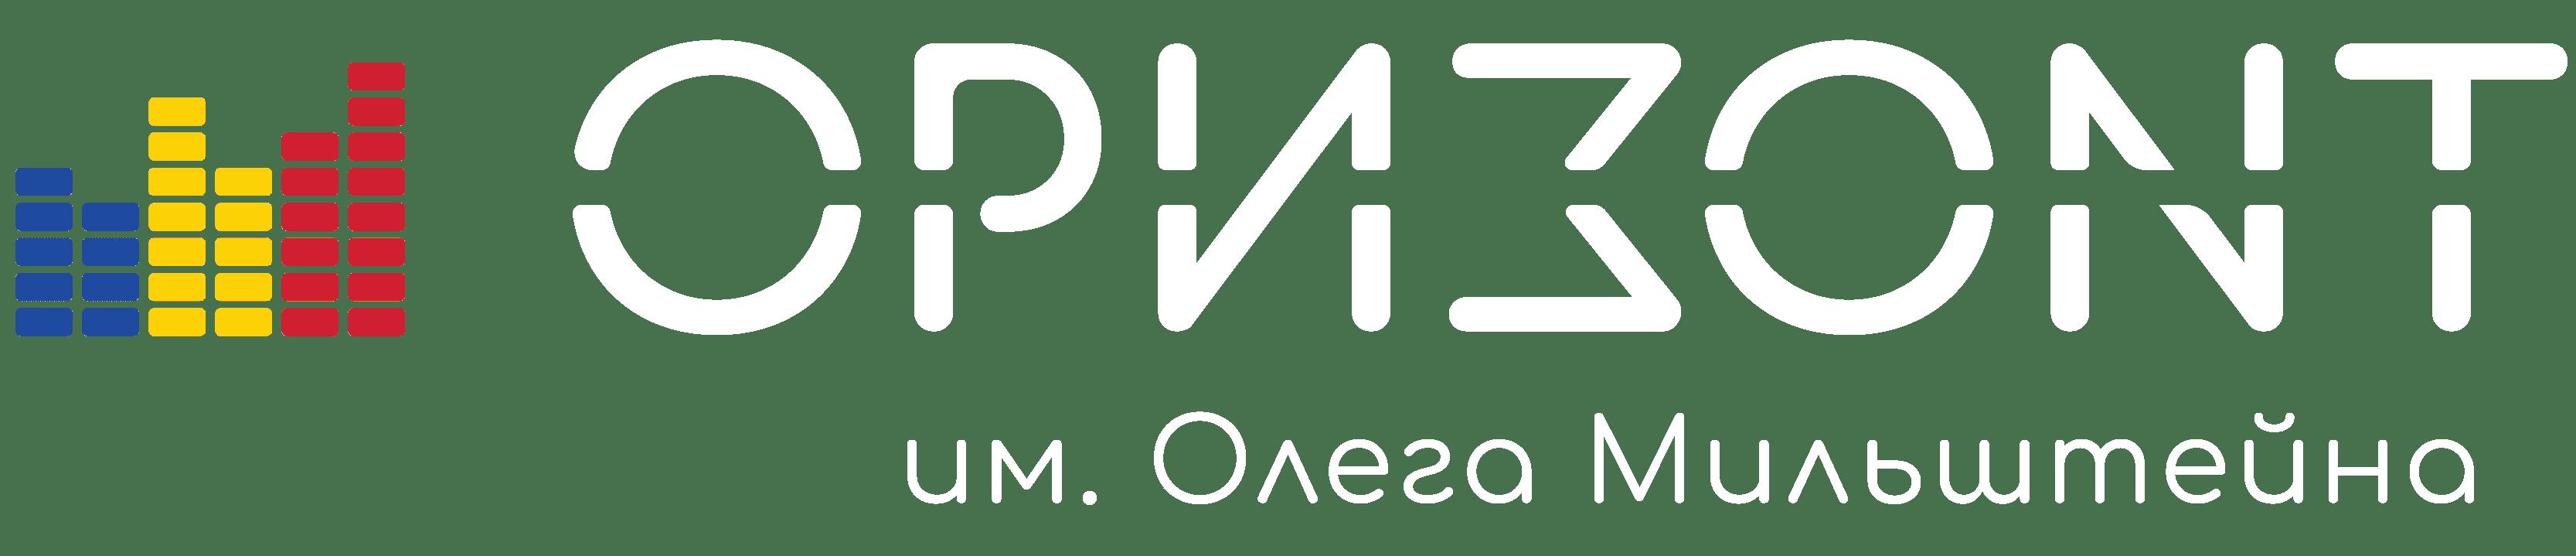 Группа «Оризонт»